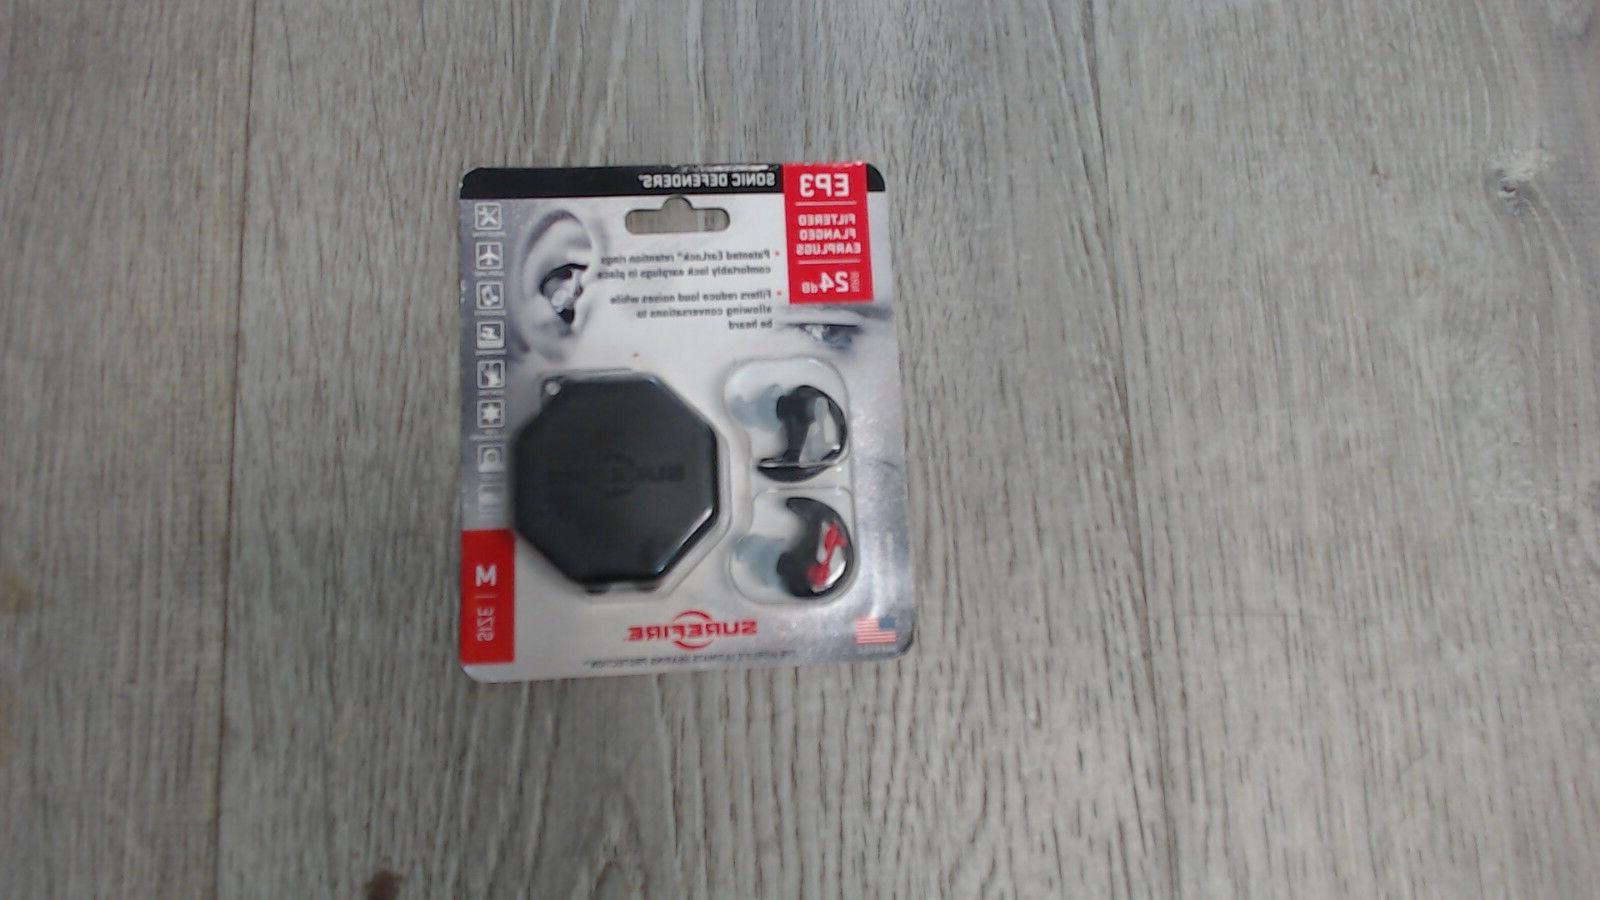 ep3 sonic defenders 24db filtered flanged earplugs